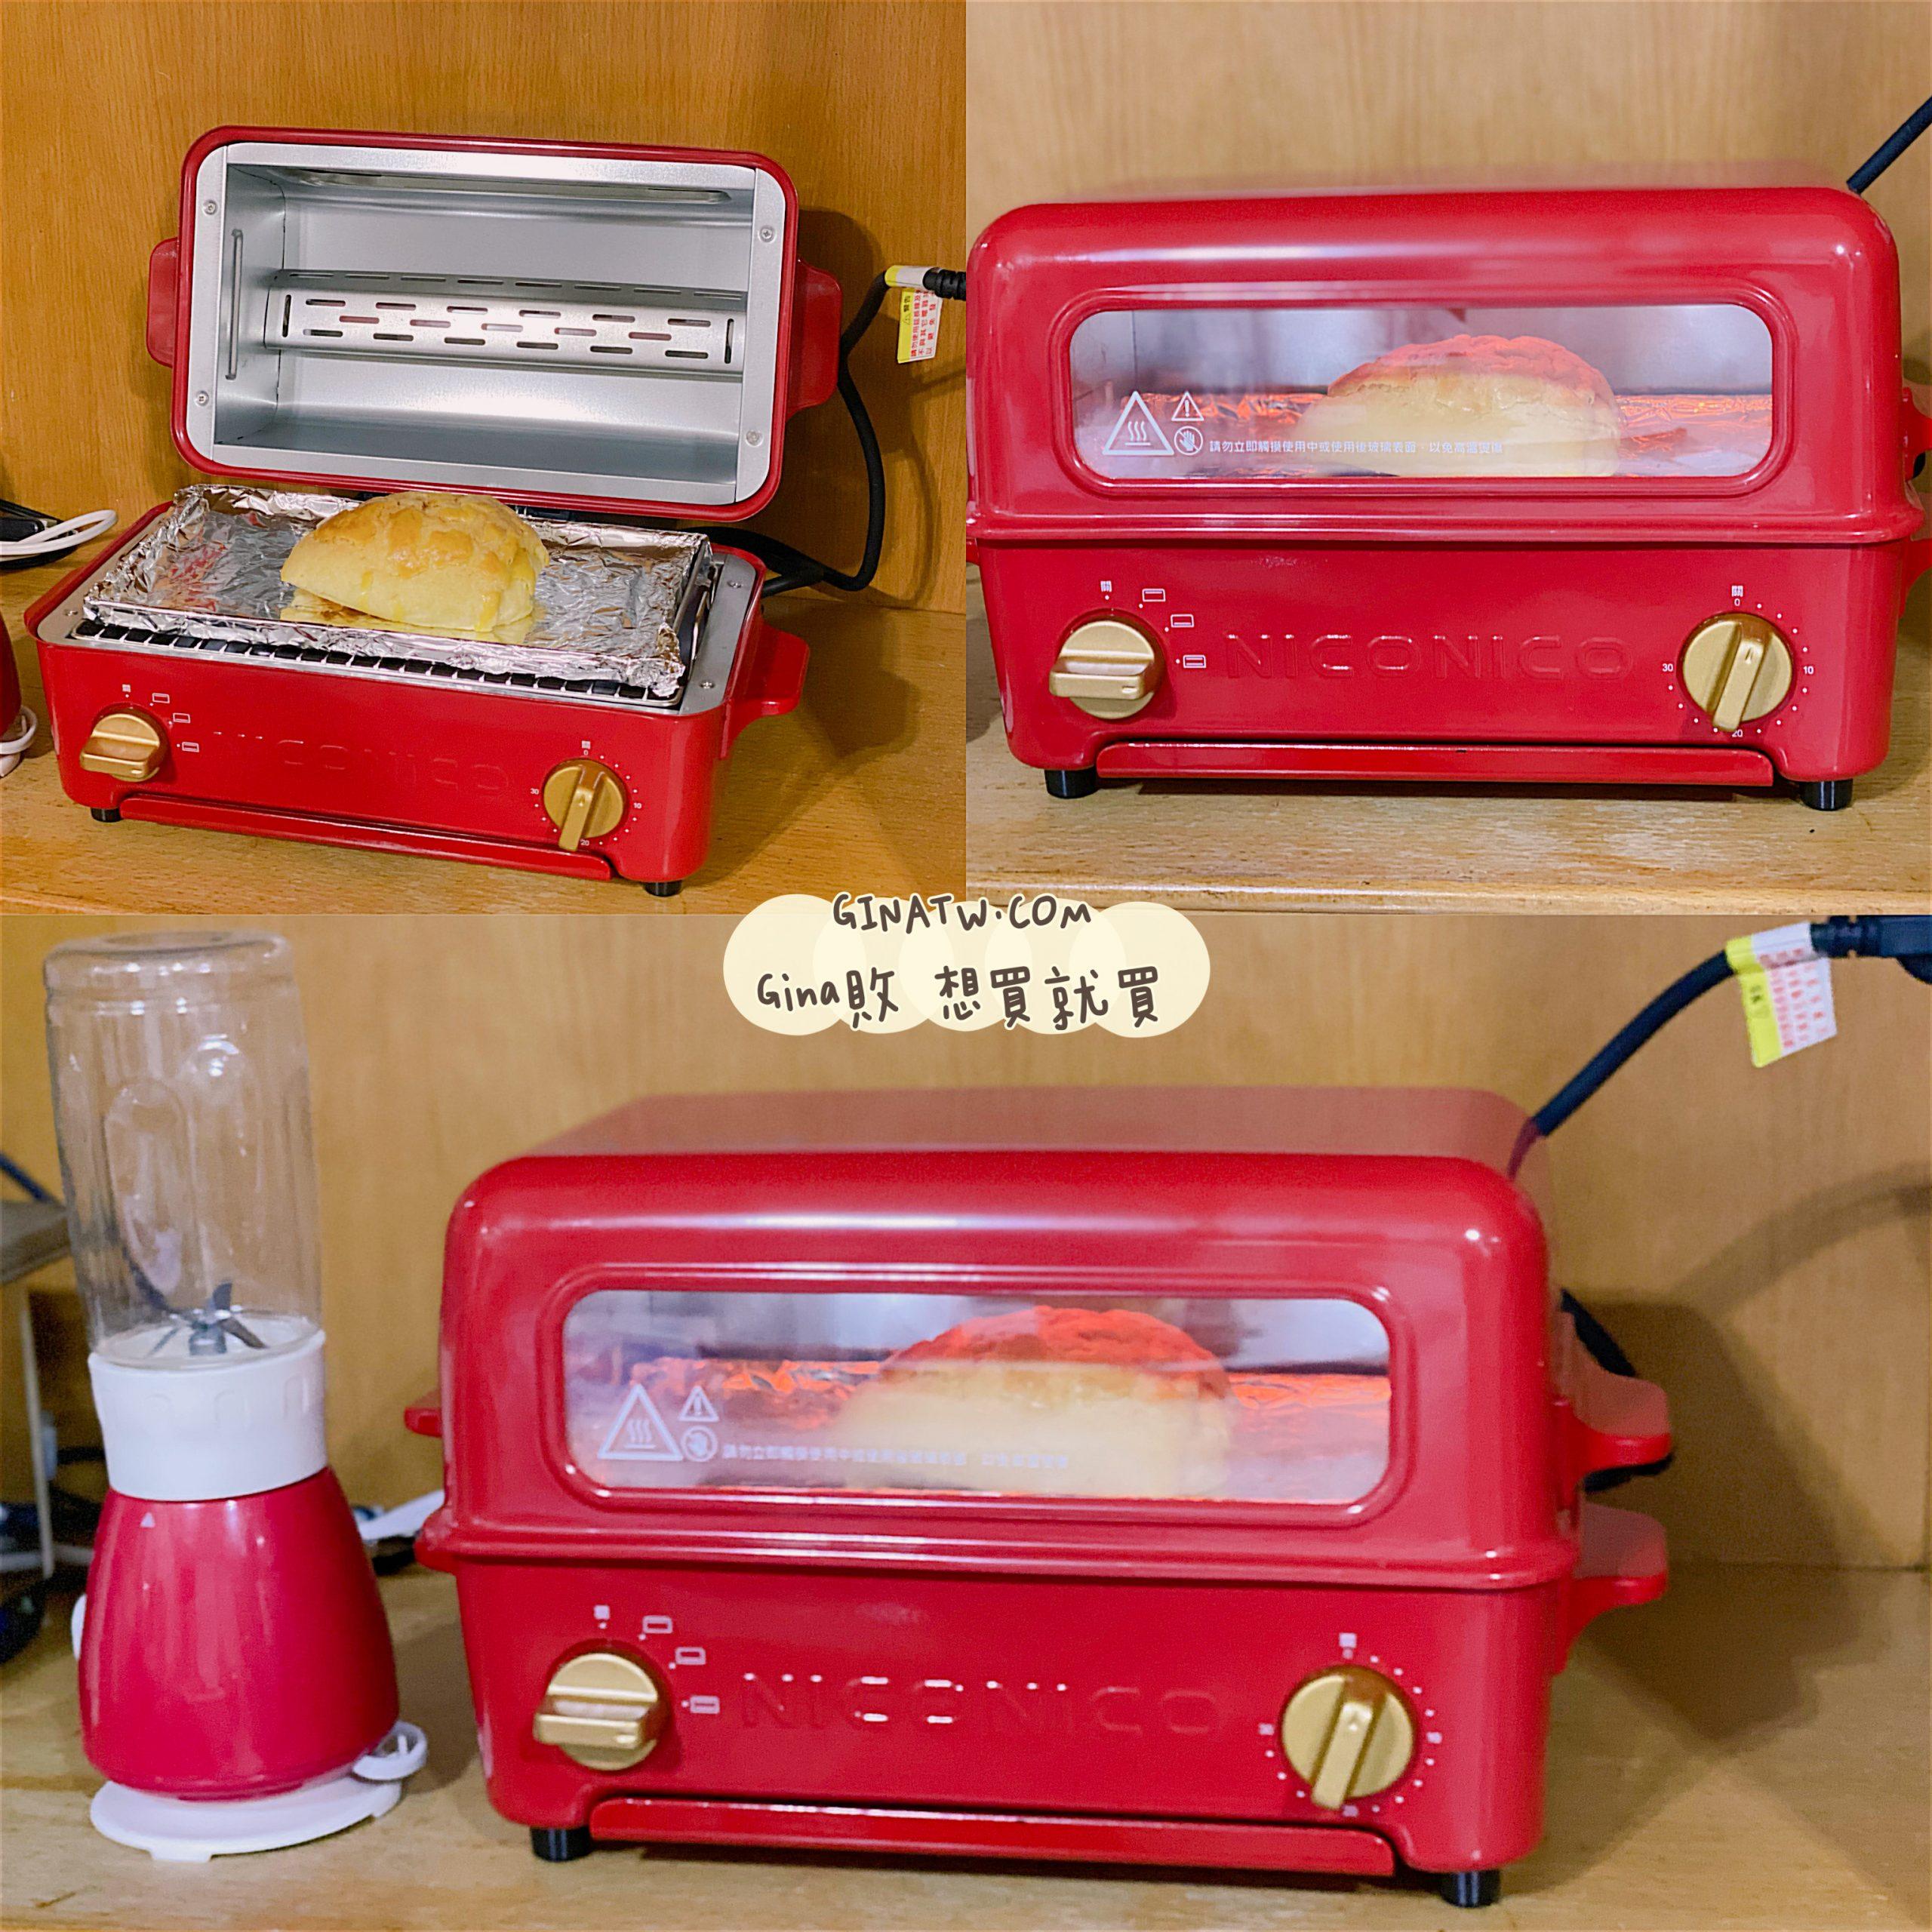 NICONICO掀蓋燒烤式蒸氣烤箱NI-S805|焗烤雞腿排、烤厚片土司、菠蘿油麵包 @GINA環球旅行生活|不會韓文也可以去韓國 🇹🇼